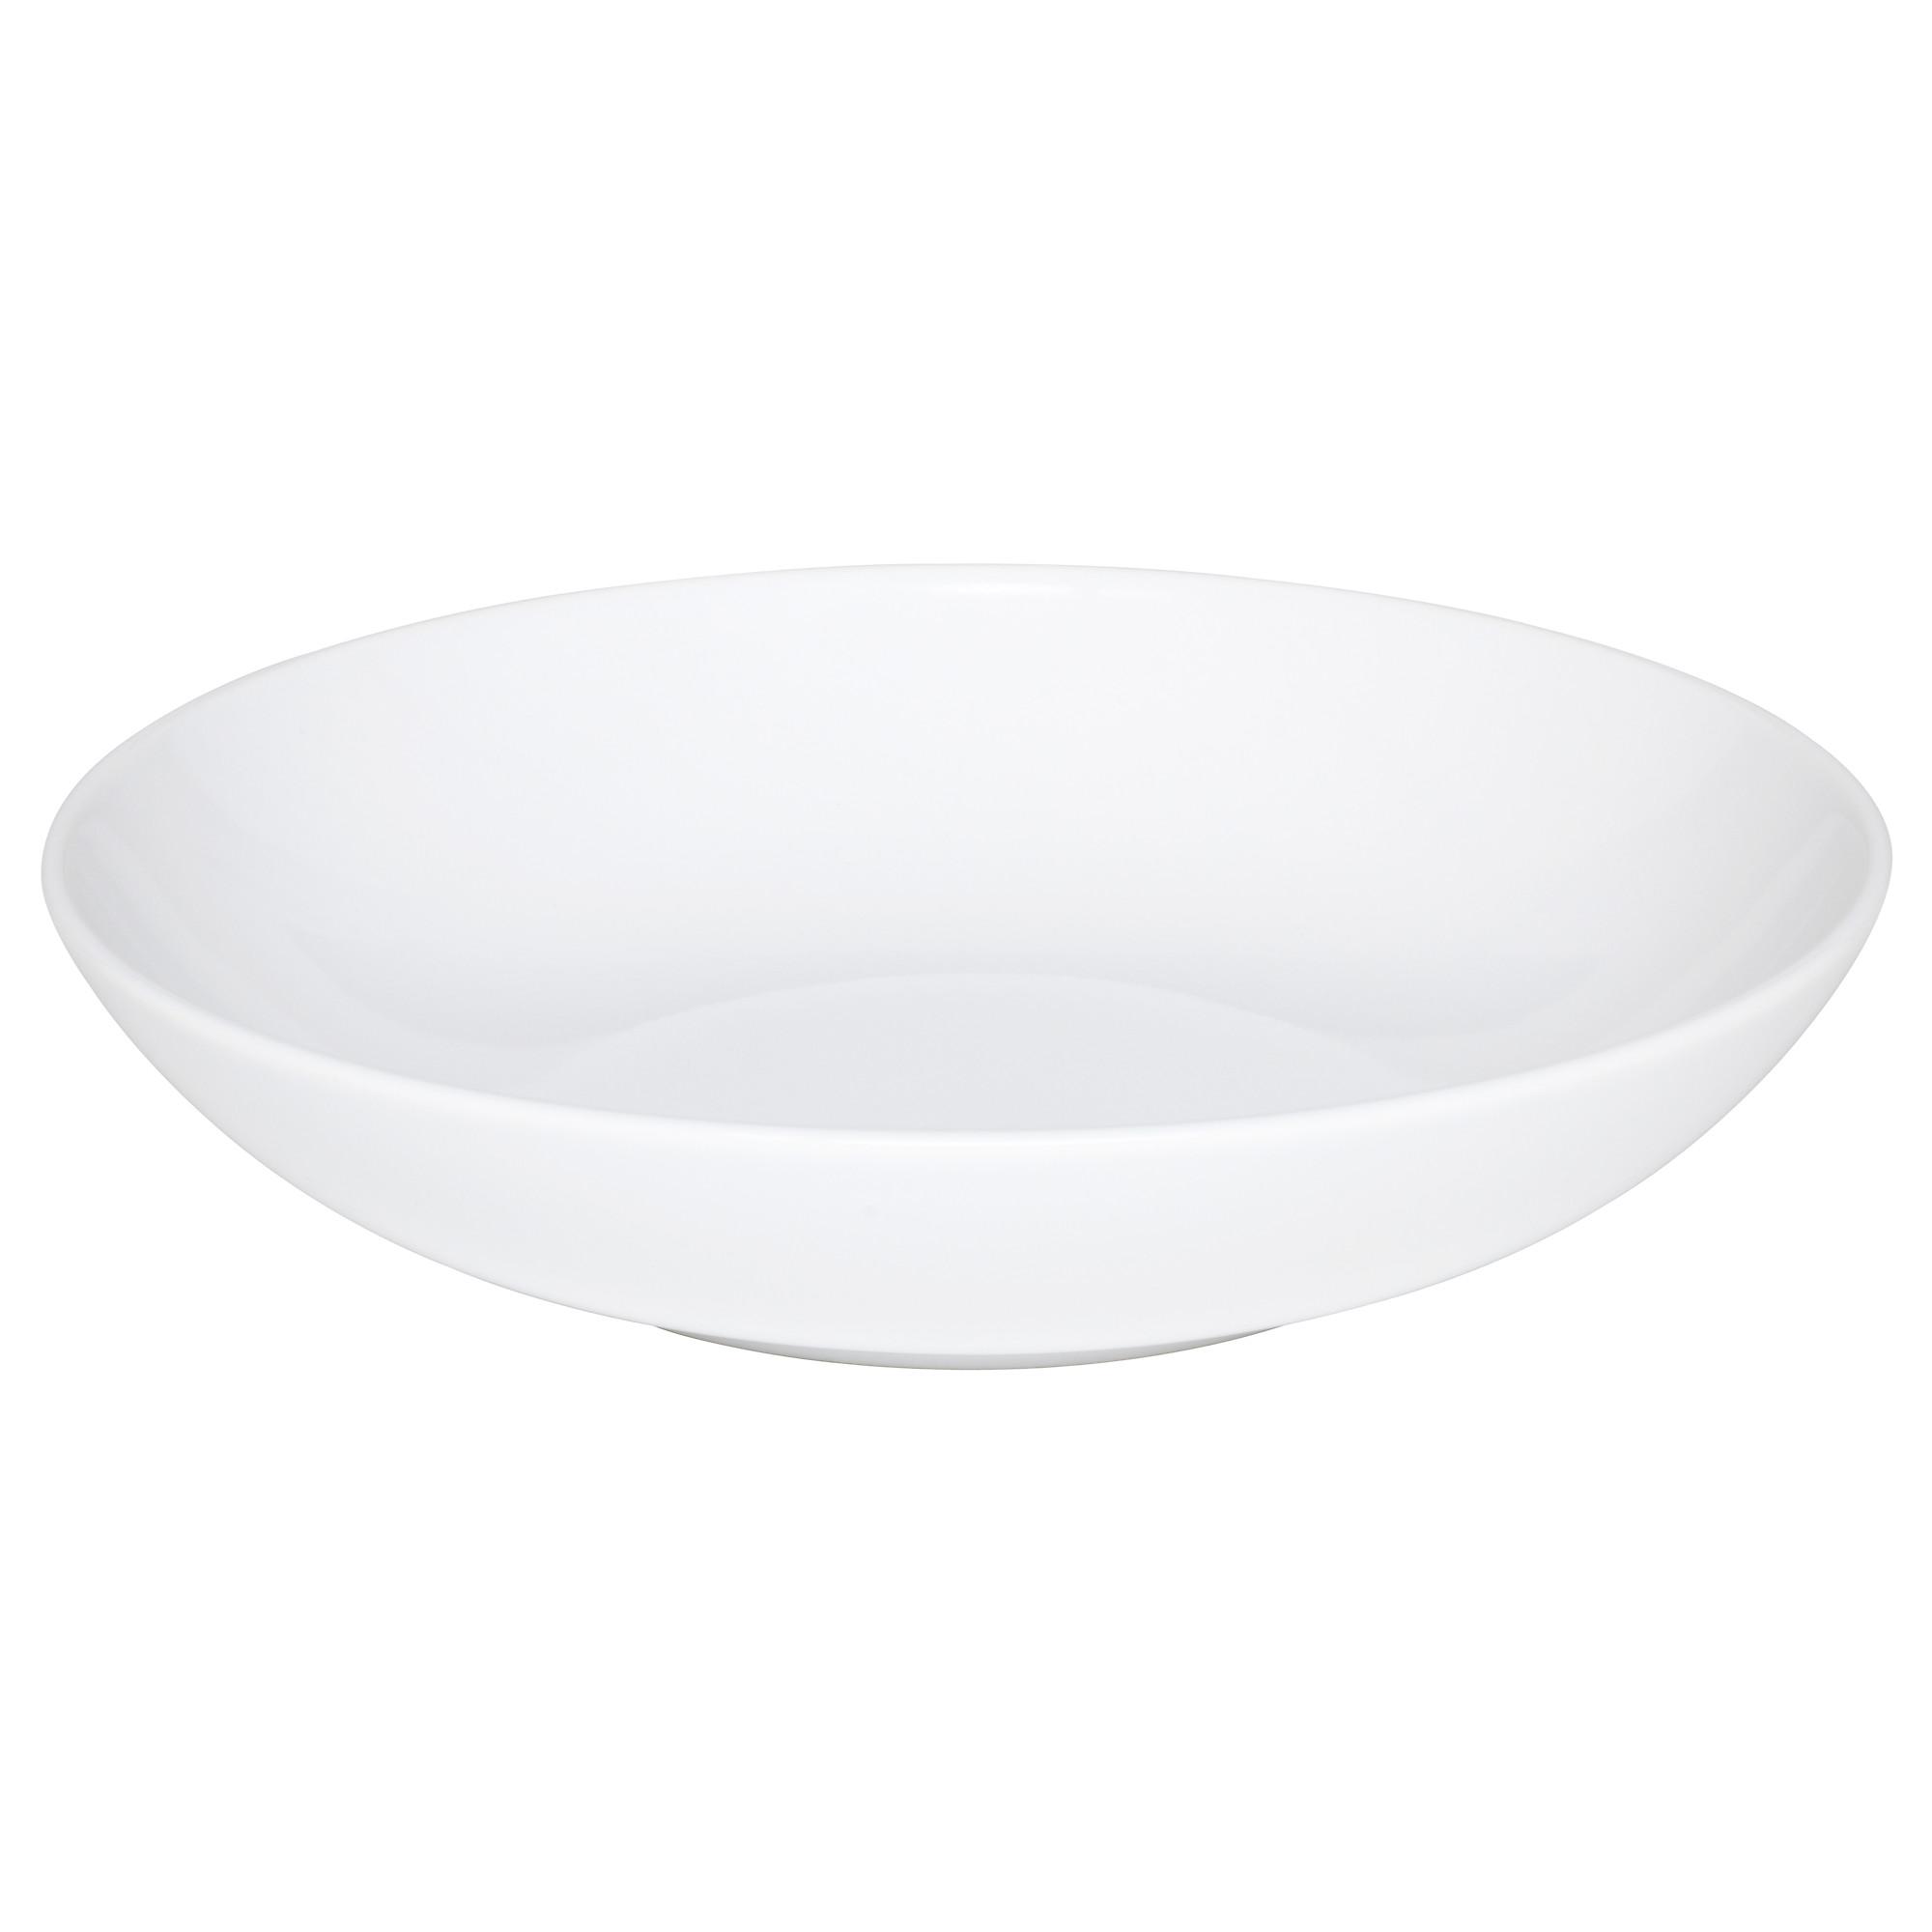 Deep plates.